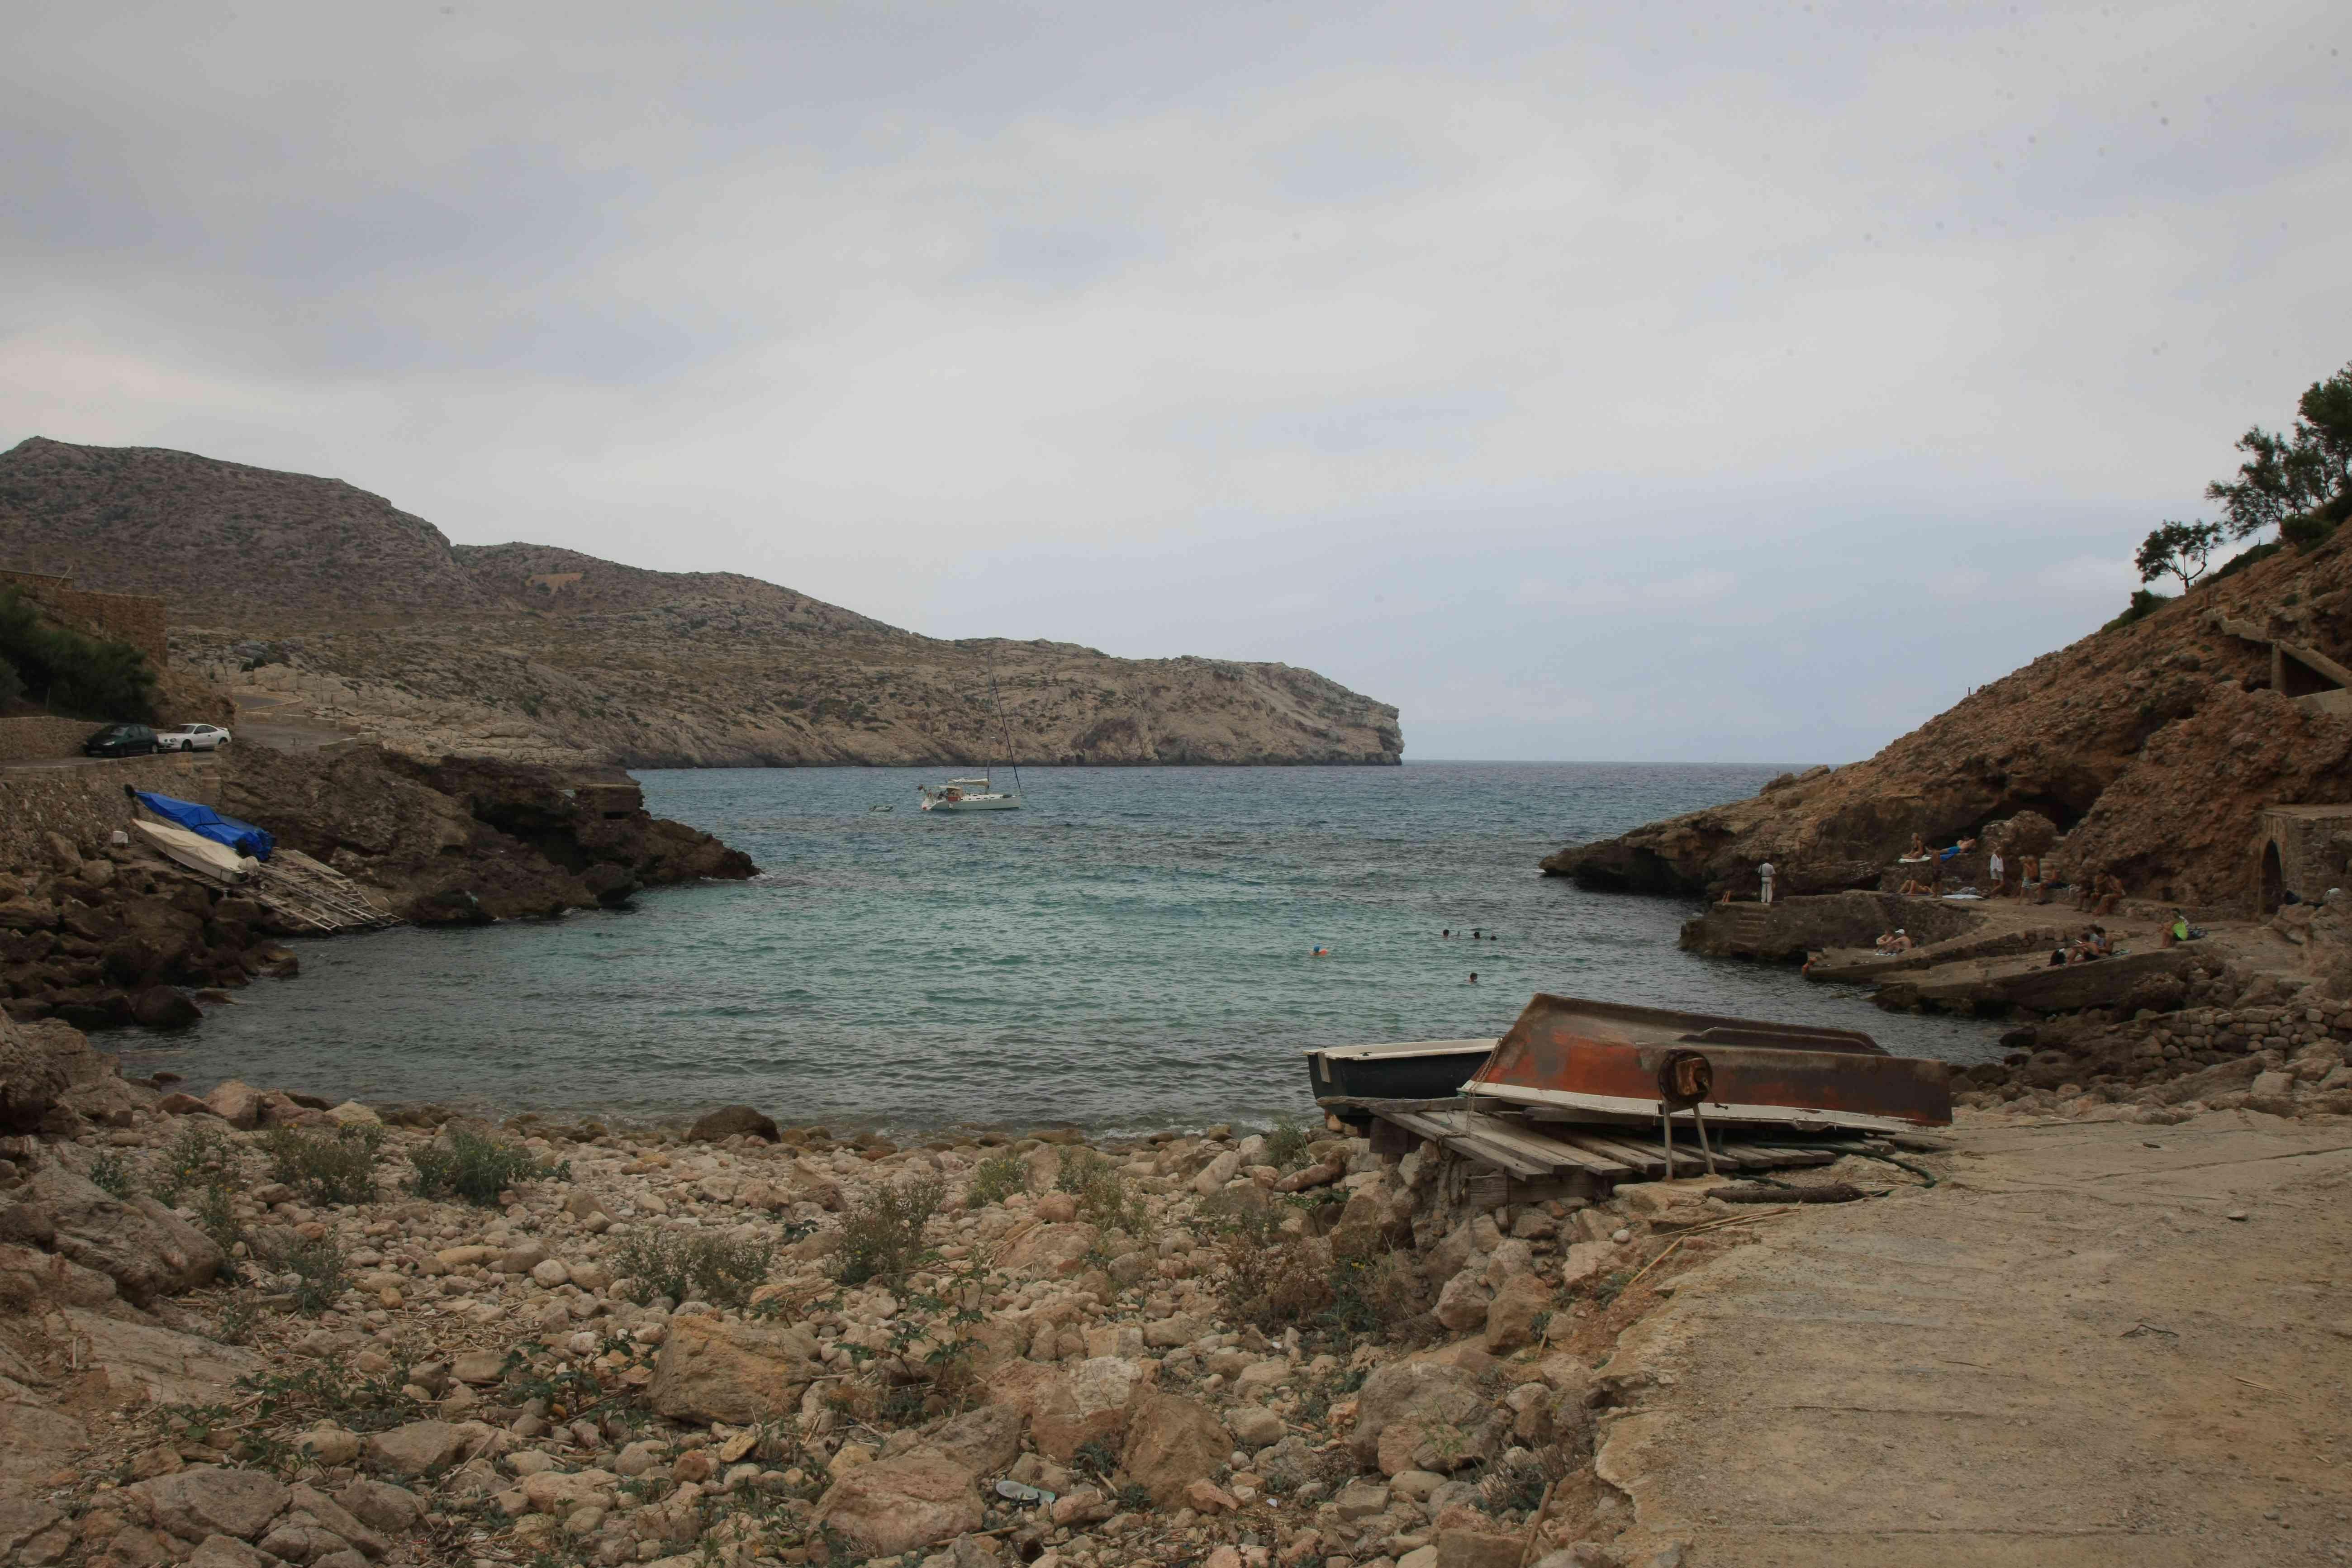 Watching the ships at Bay Calobra Torrent de Pareis Sa Cobra Mallorca Marvelous Mallorca Pinterest